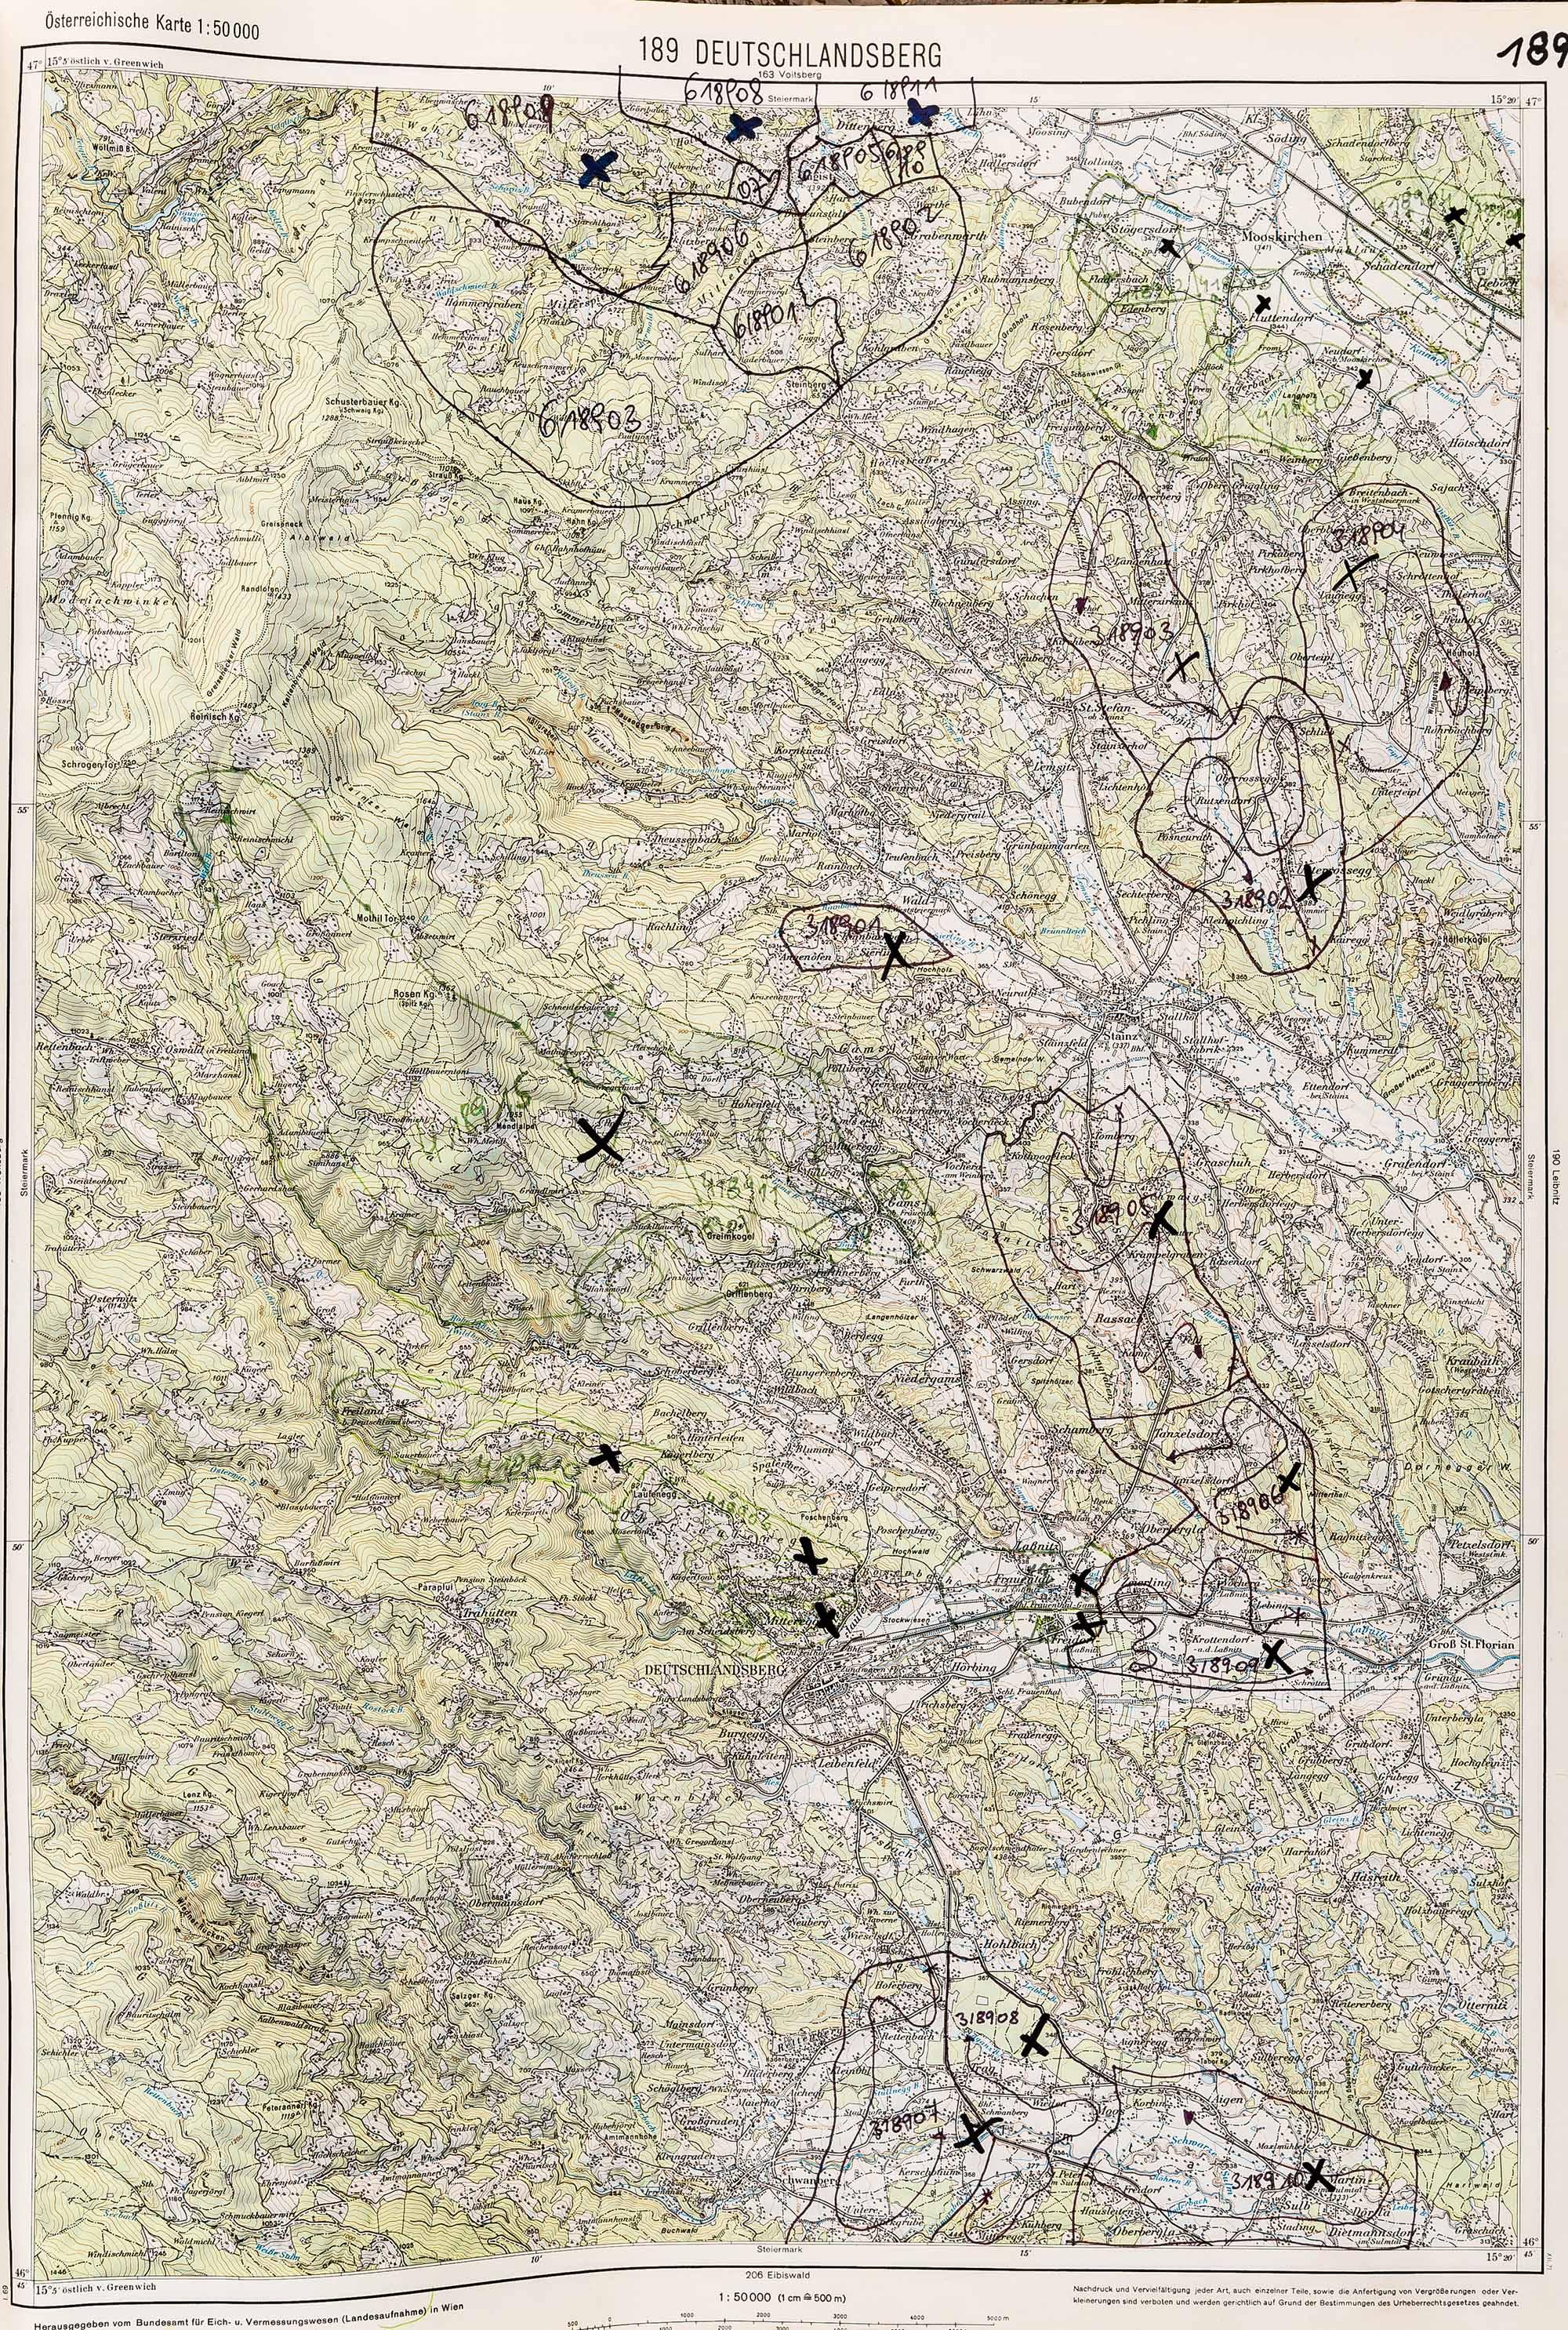 1983-1986 Karte 189